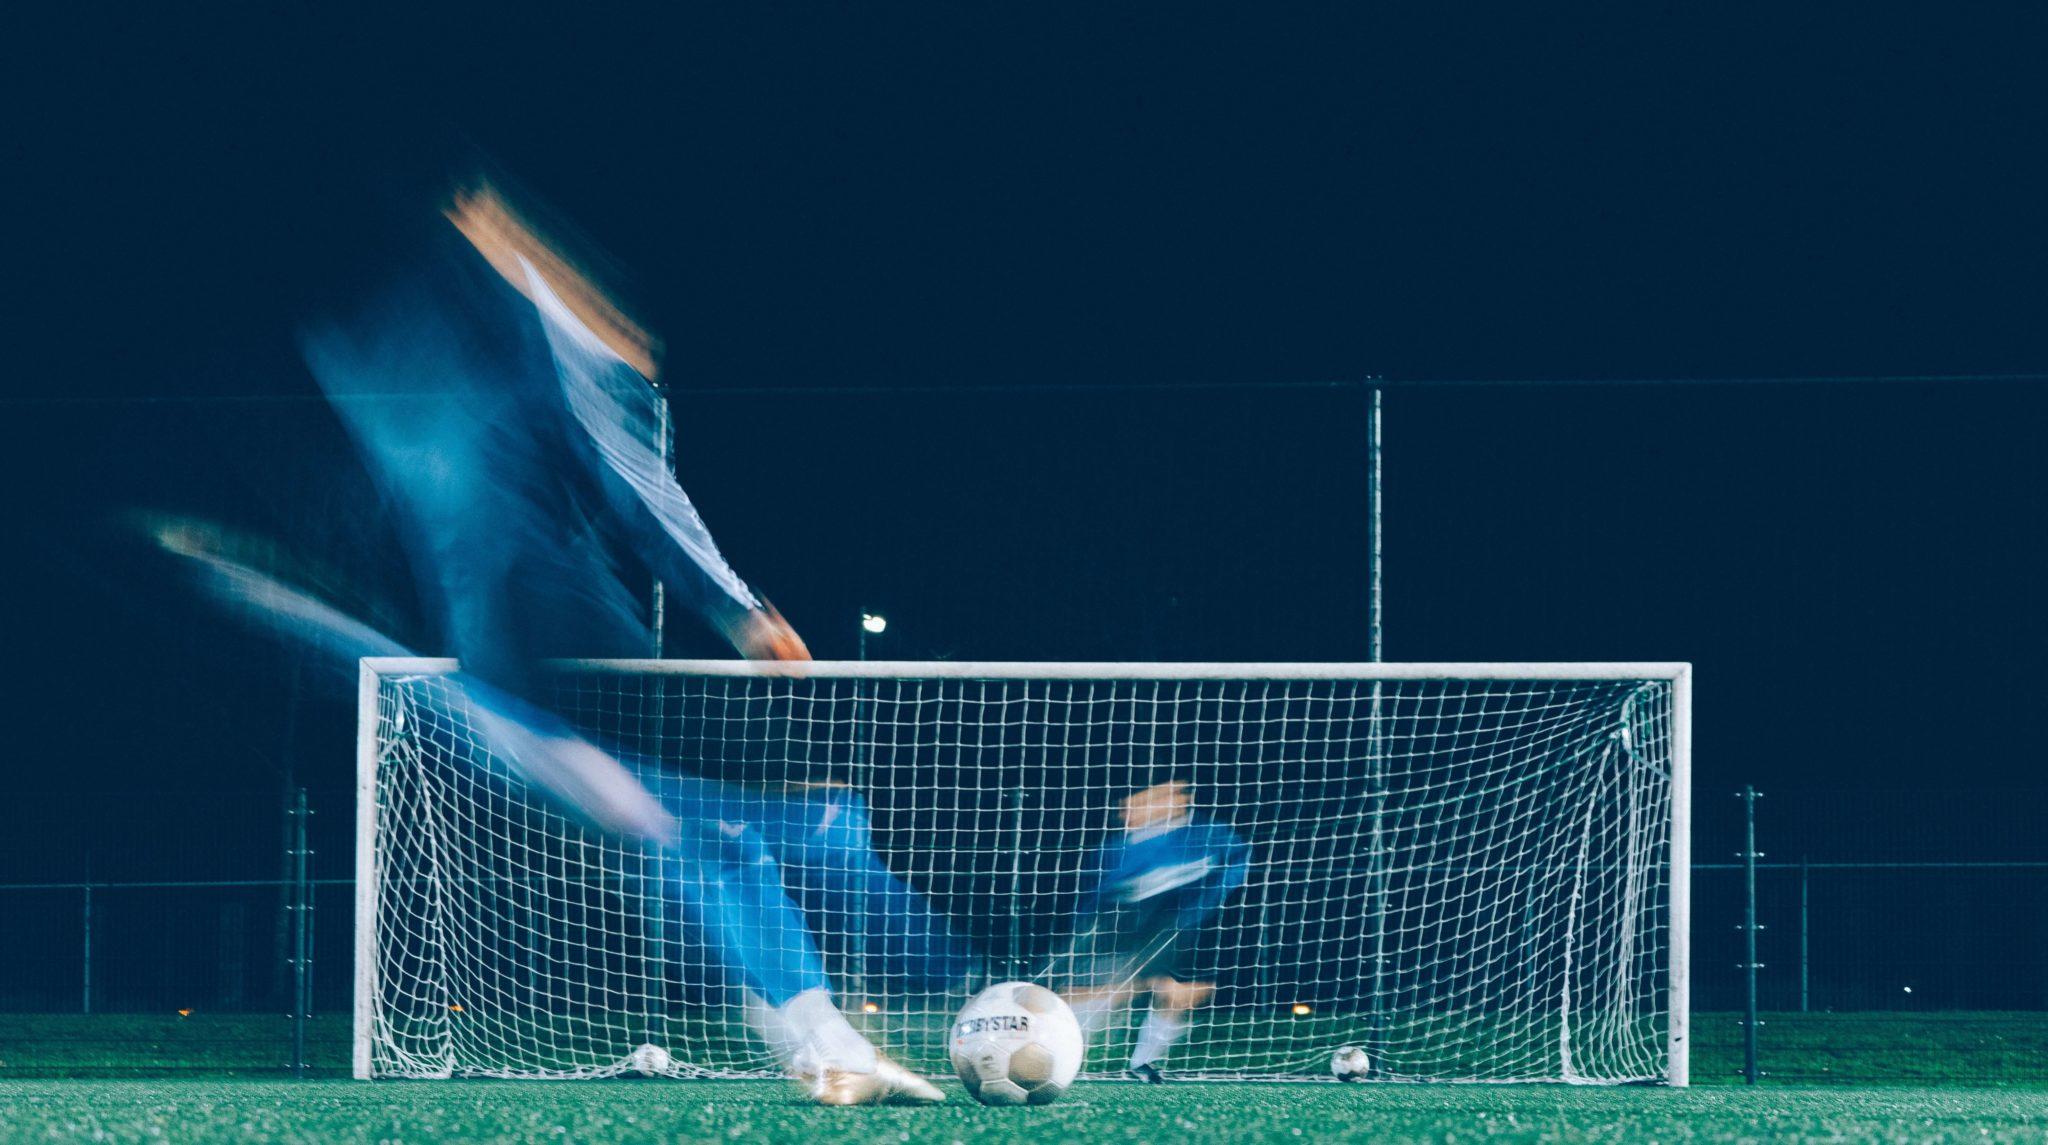 Artistic shot of footballer kicking ball towards goal and goalkeeper